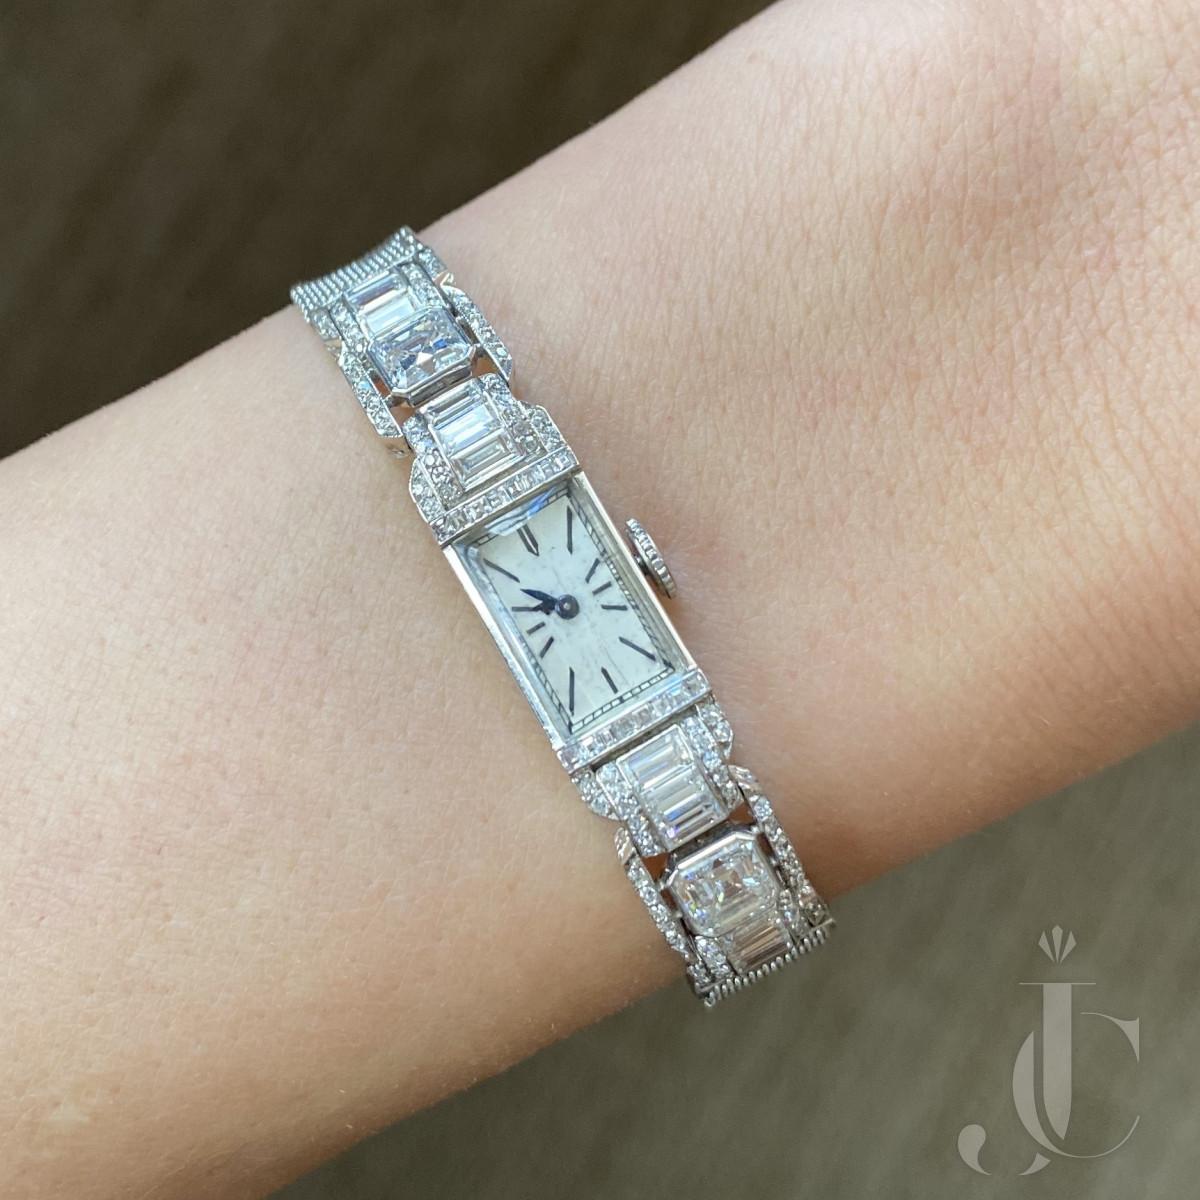 Platinum Diamonds Art Deco Ladies Watch